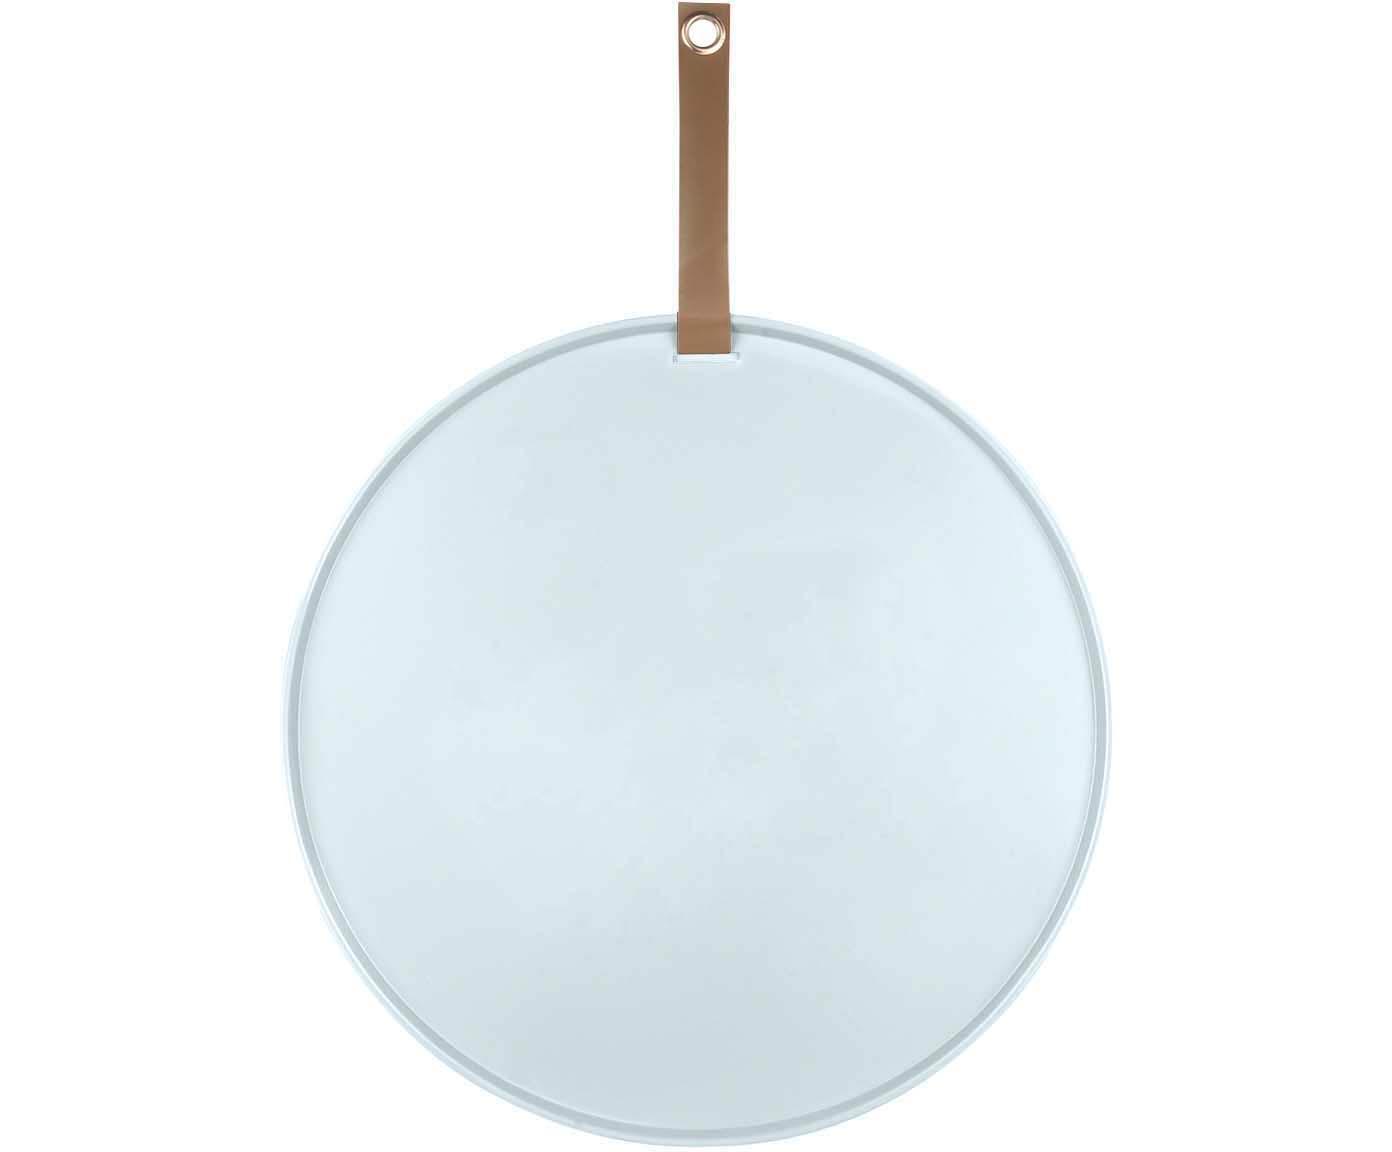 Prikbord Perky, Gelakt metaal, Wit, bruin, Ø 50 x T 1 cm